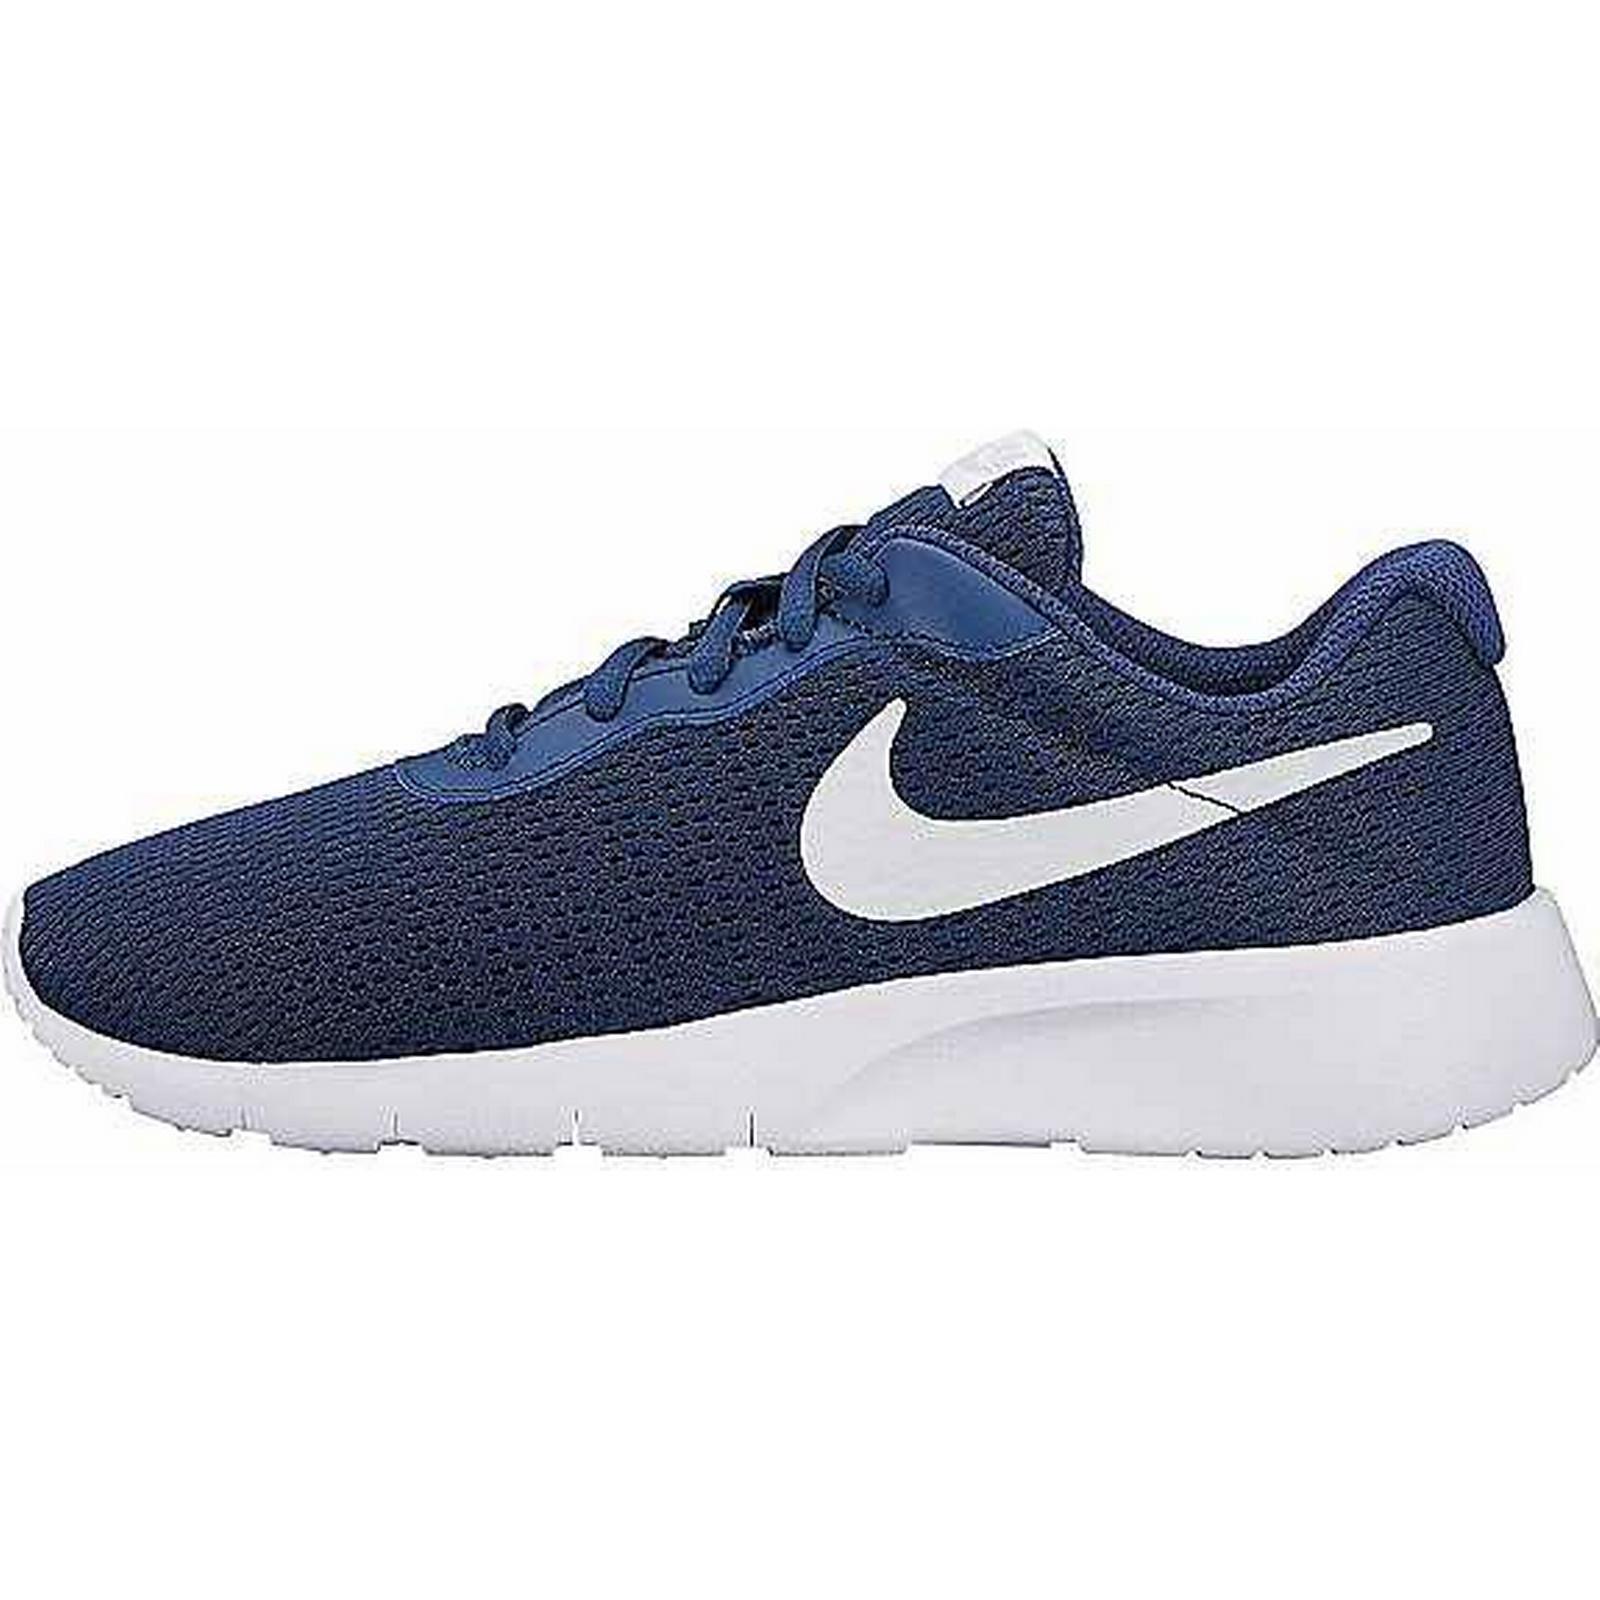 Look 'Tanjun Again 'Tanjun Look GS' Trainers by Nike ba6e25